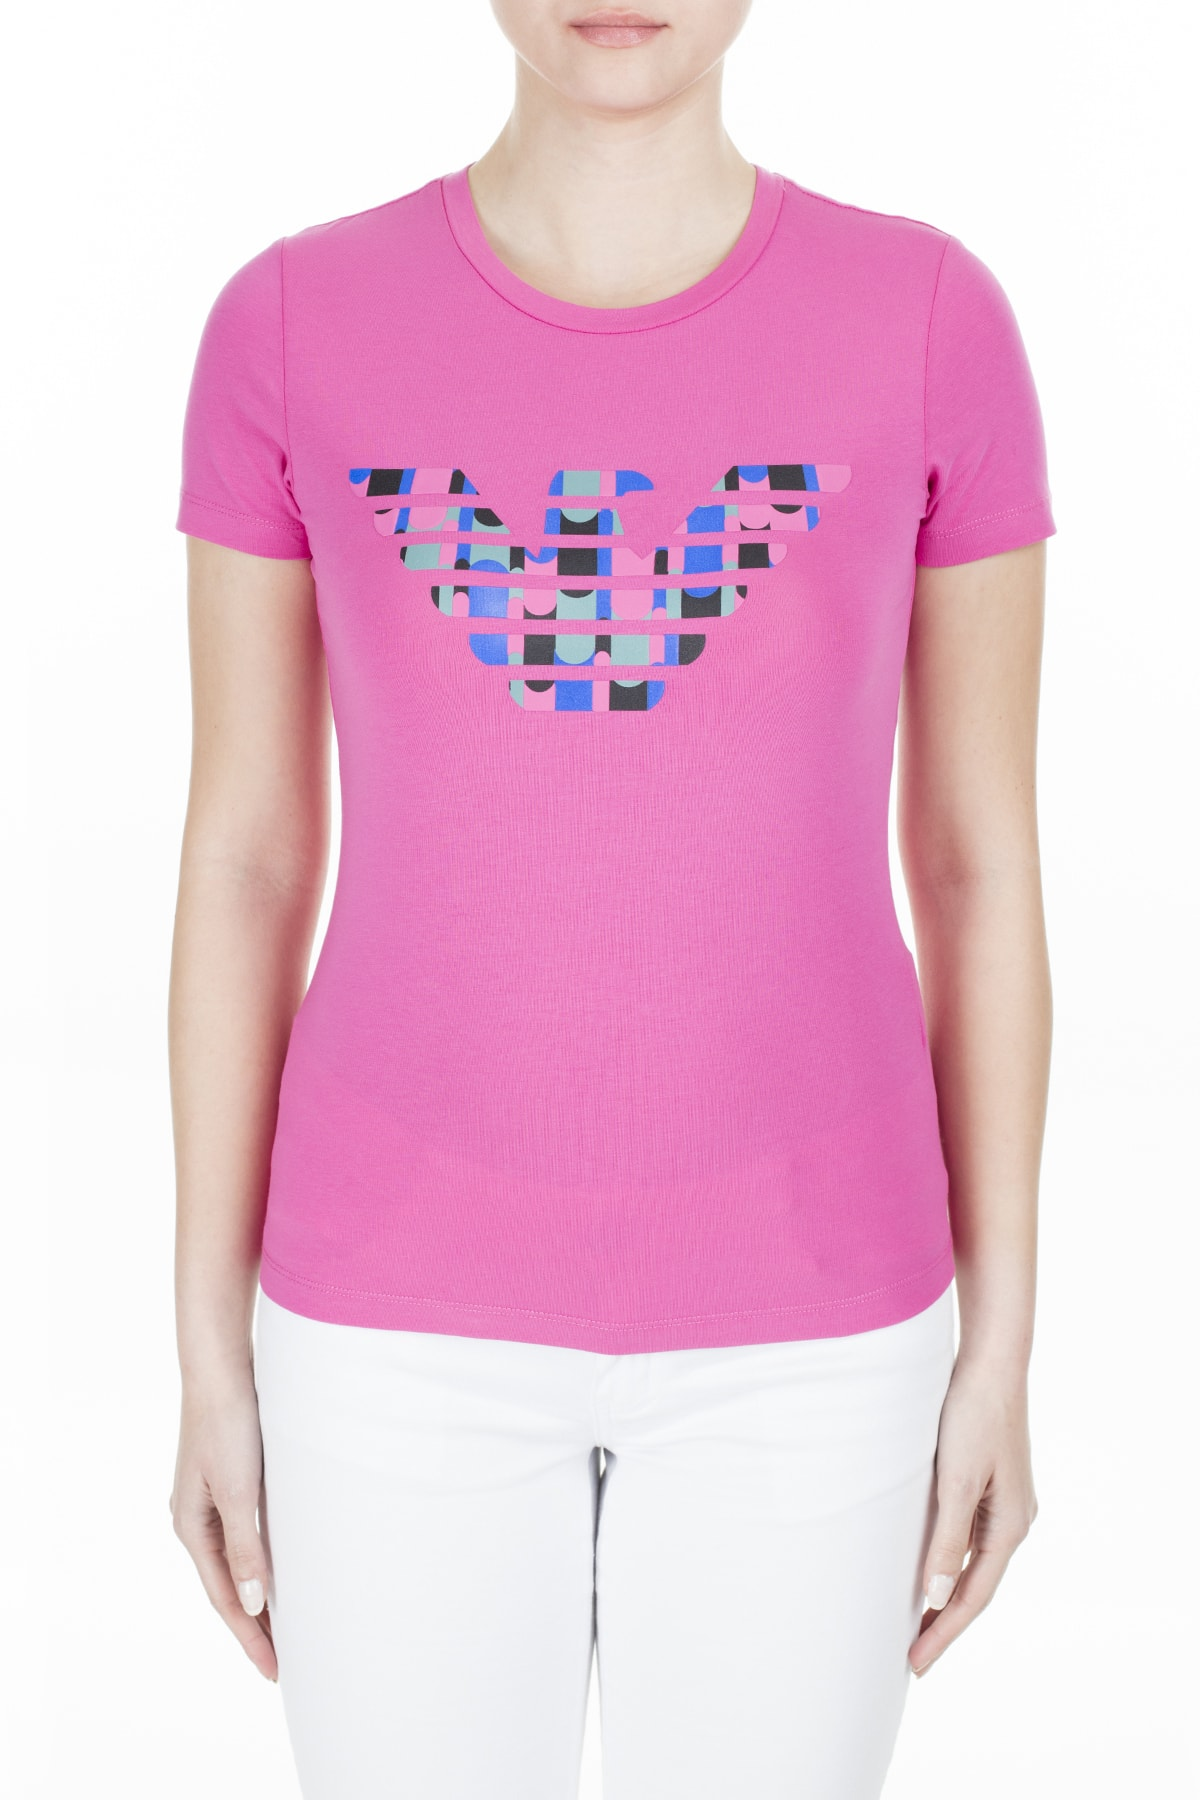 Emporio Armani Kadın Fuşya T-Shirt 3H2T8A 2J07Z 0309